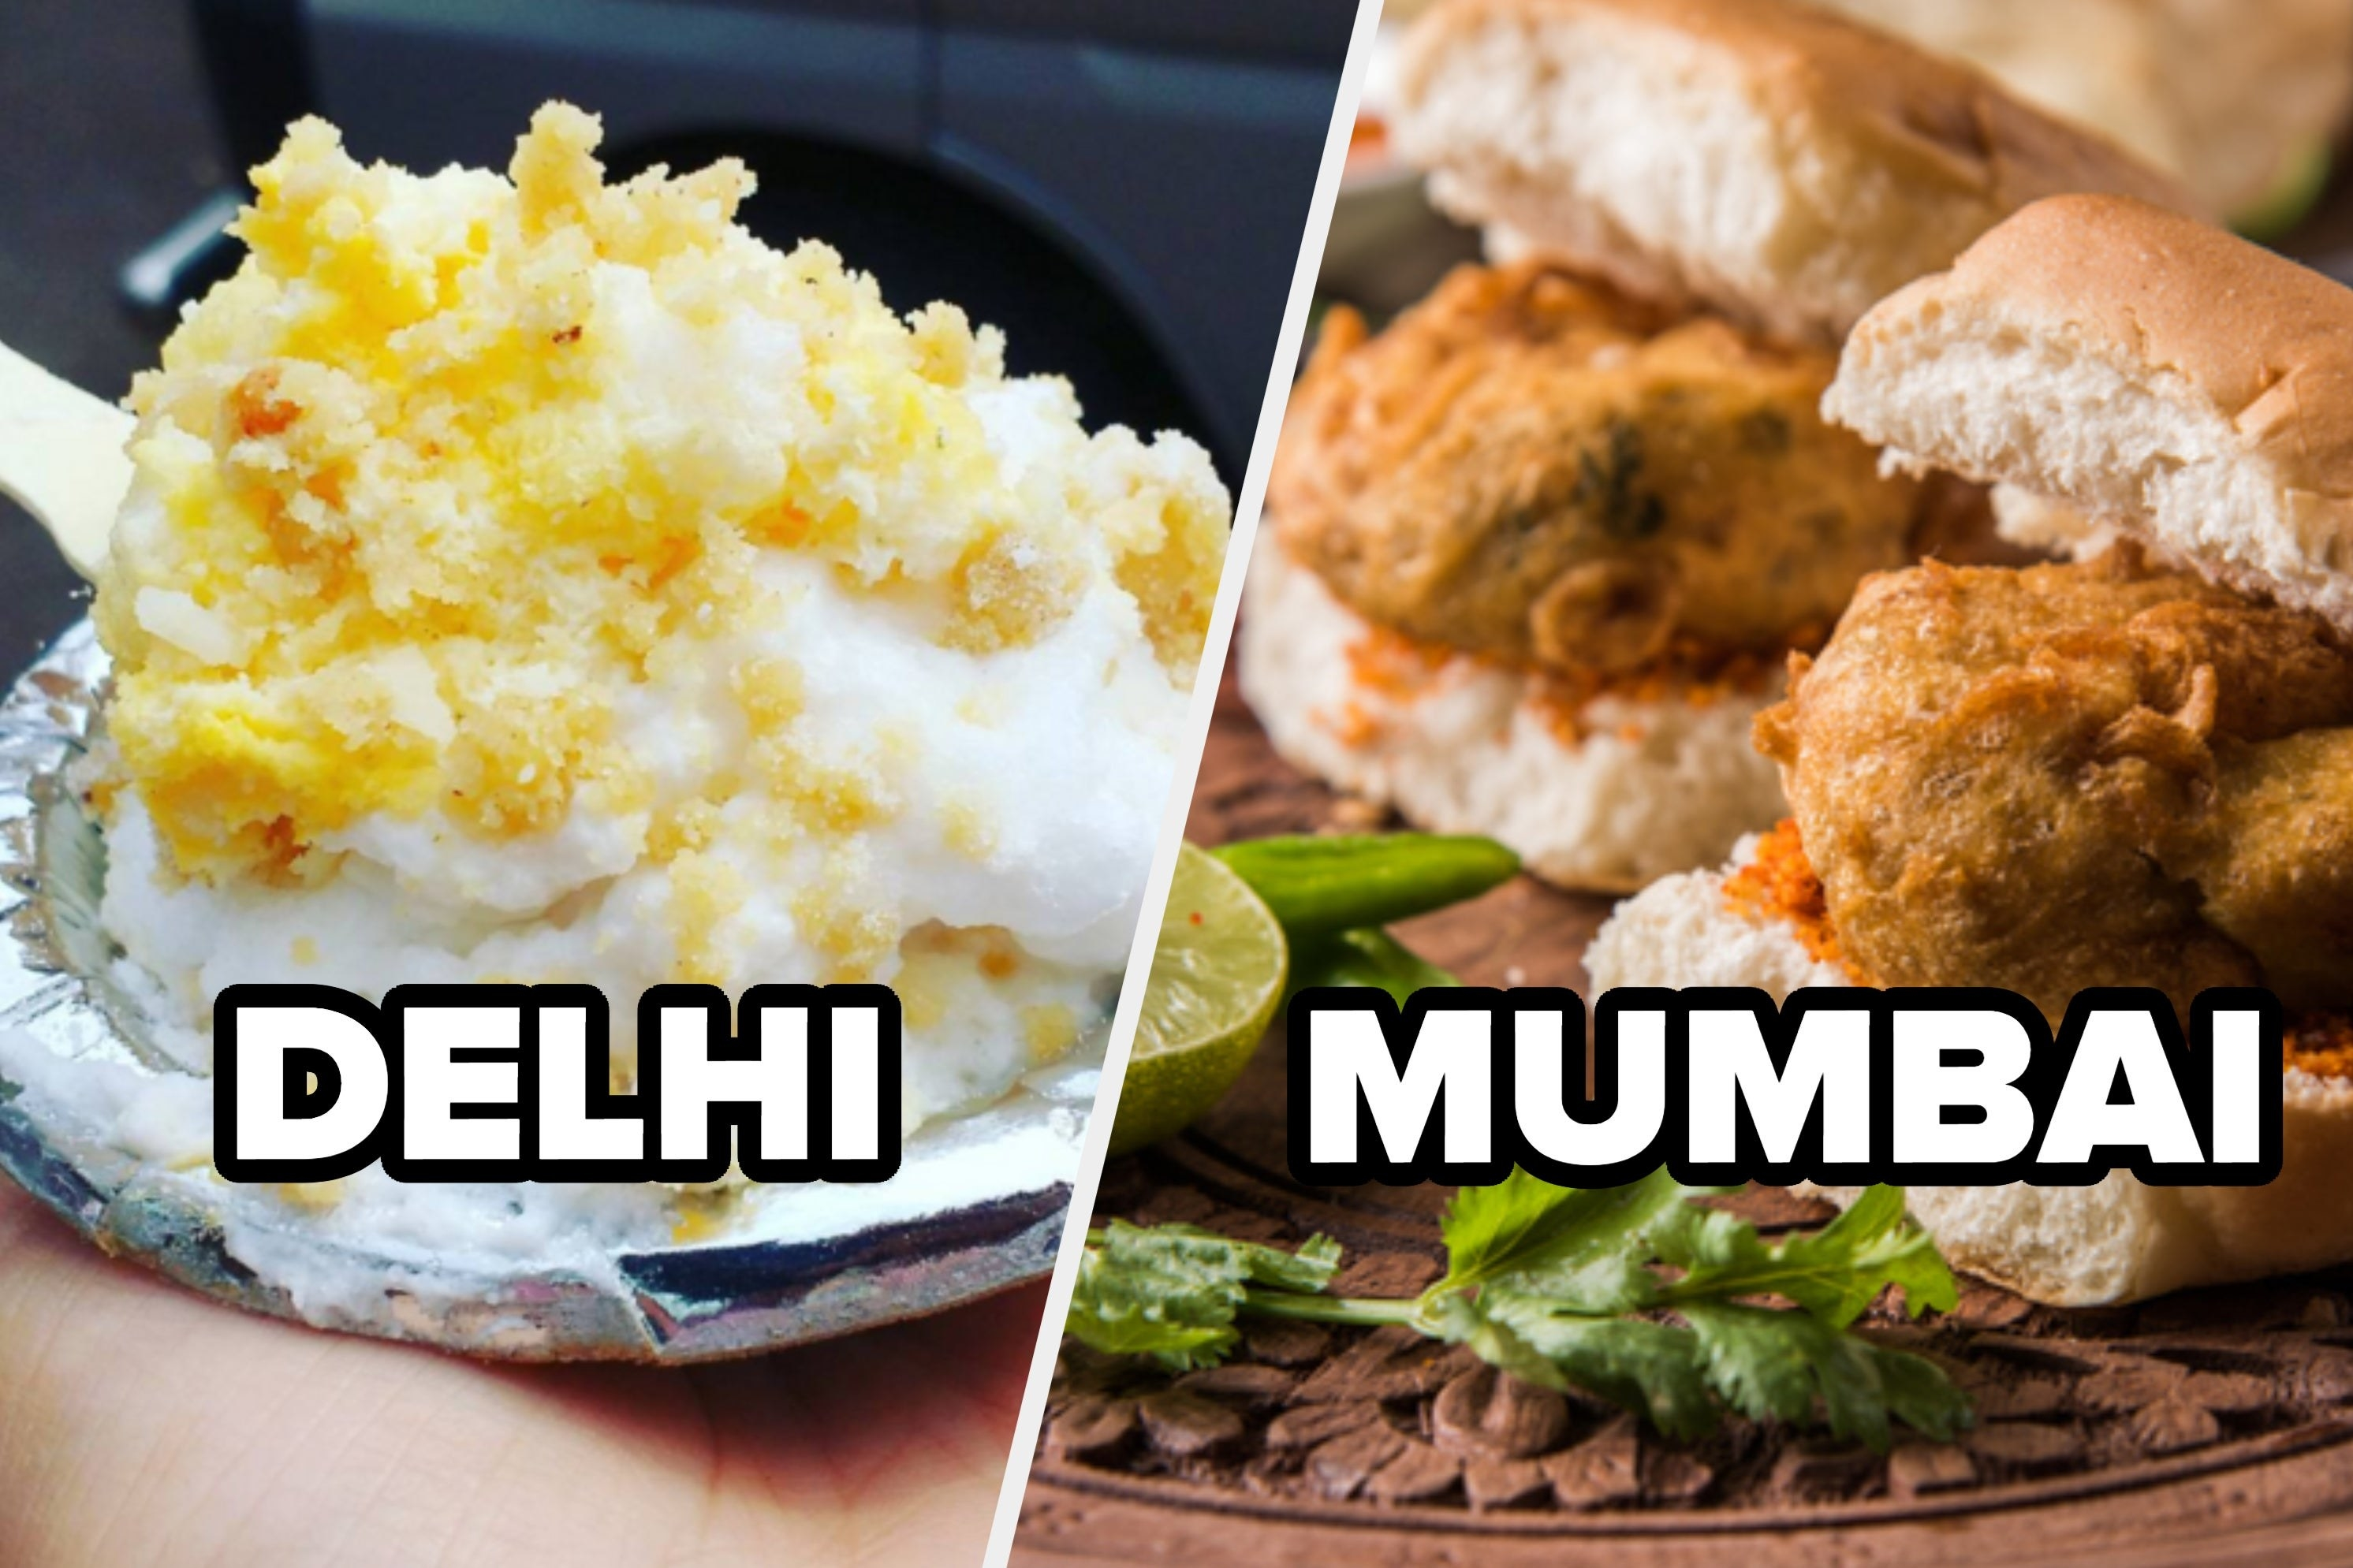 A collage of delhi's iconic daulat ki chaat and mumbai's vada pav